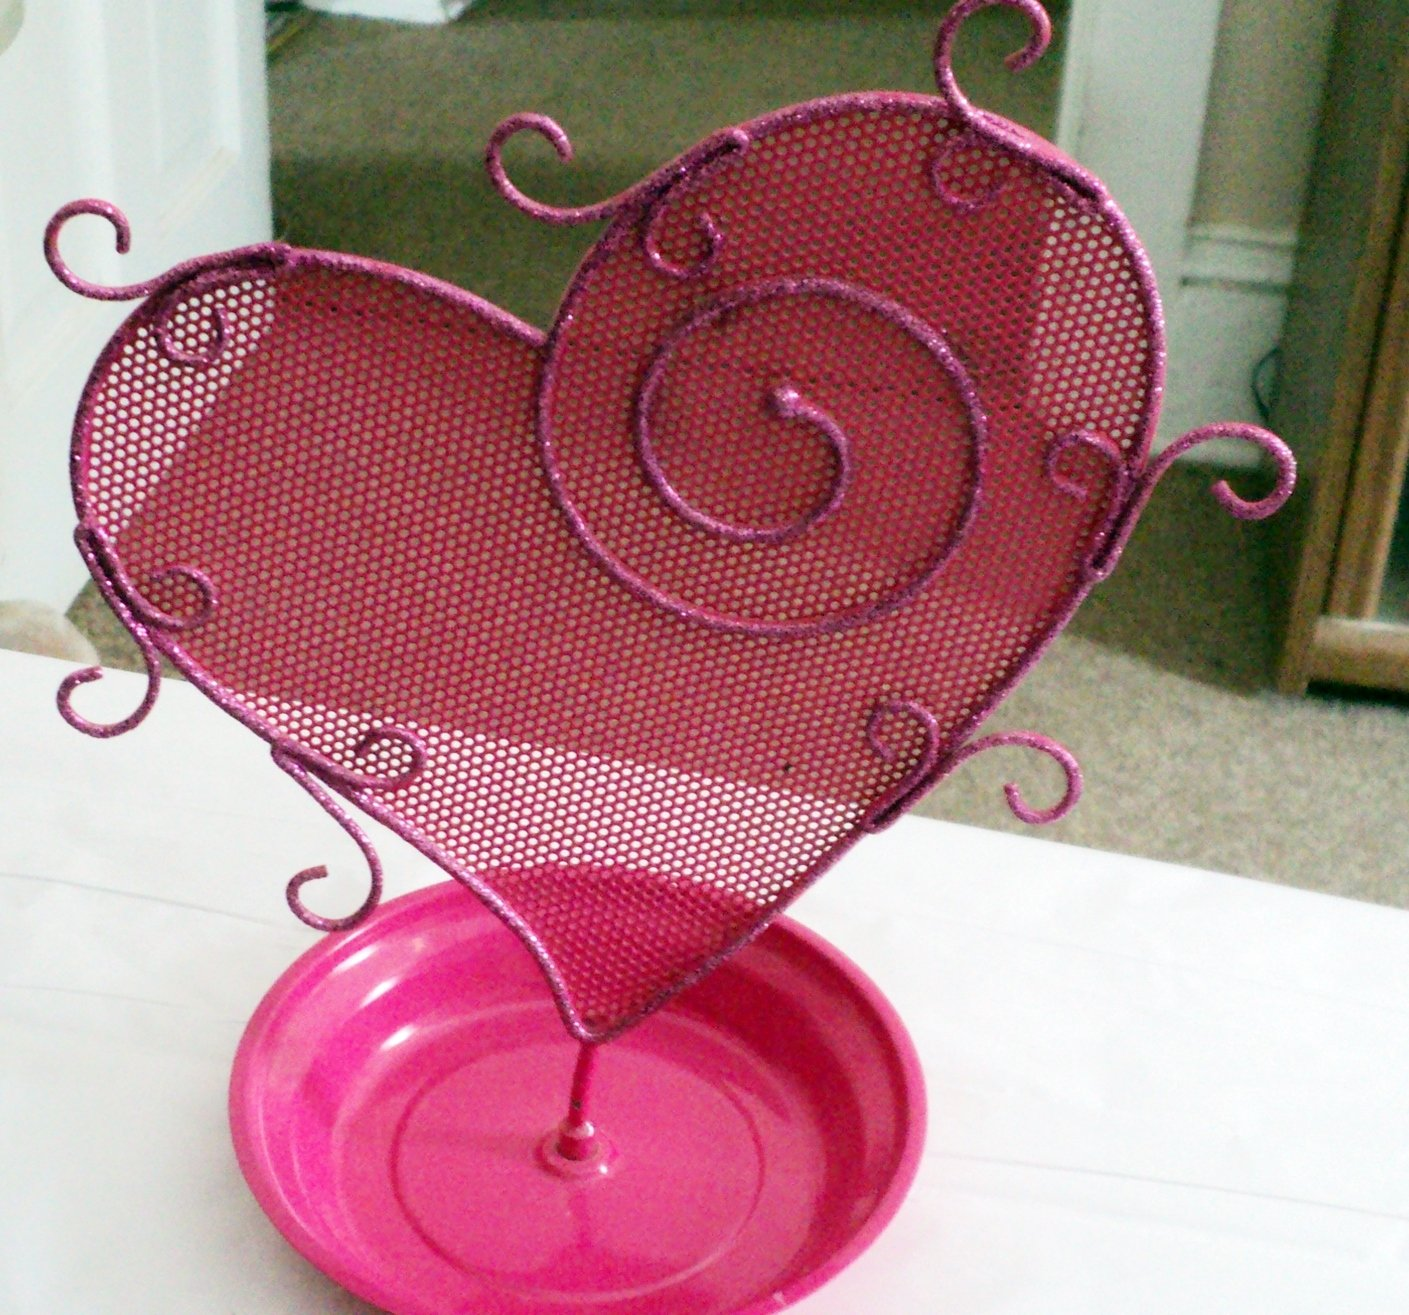 Bright Pink Heart Bling Metal Mesh Earring Ear Stud Jewelry Display Holder Rack #00237